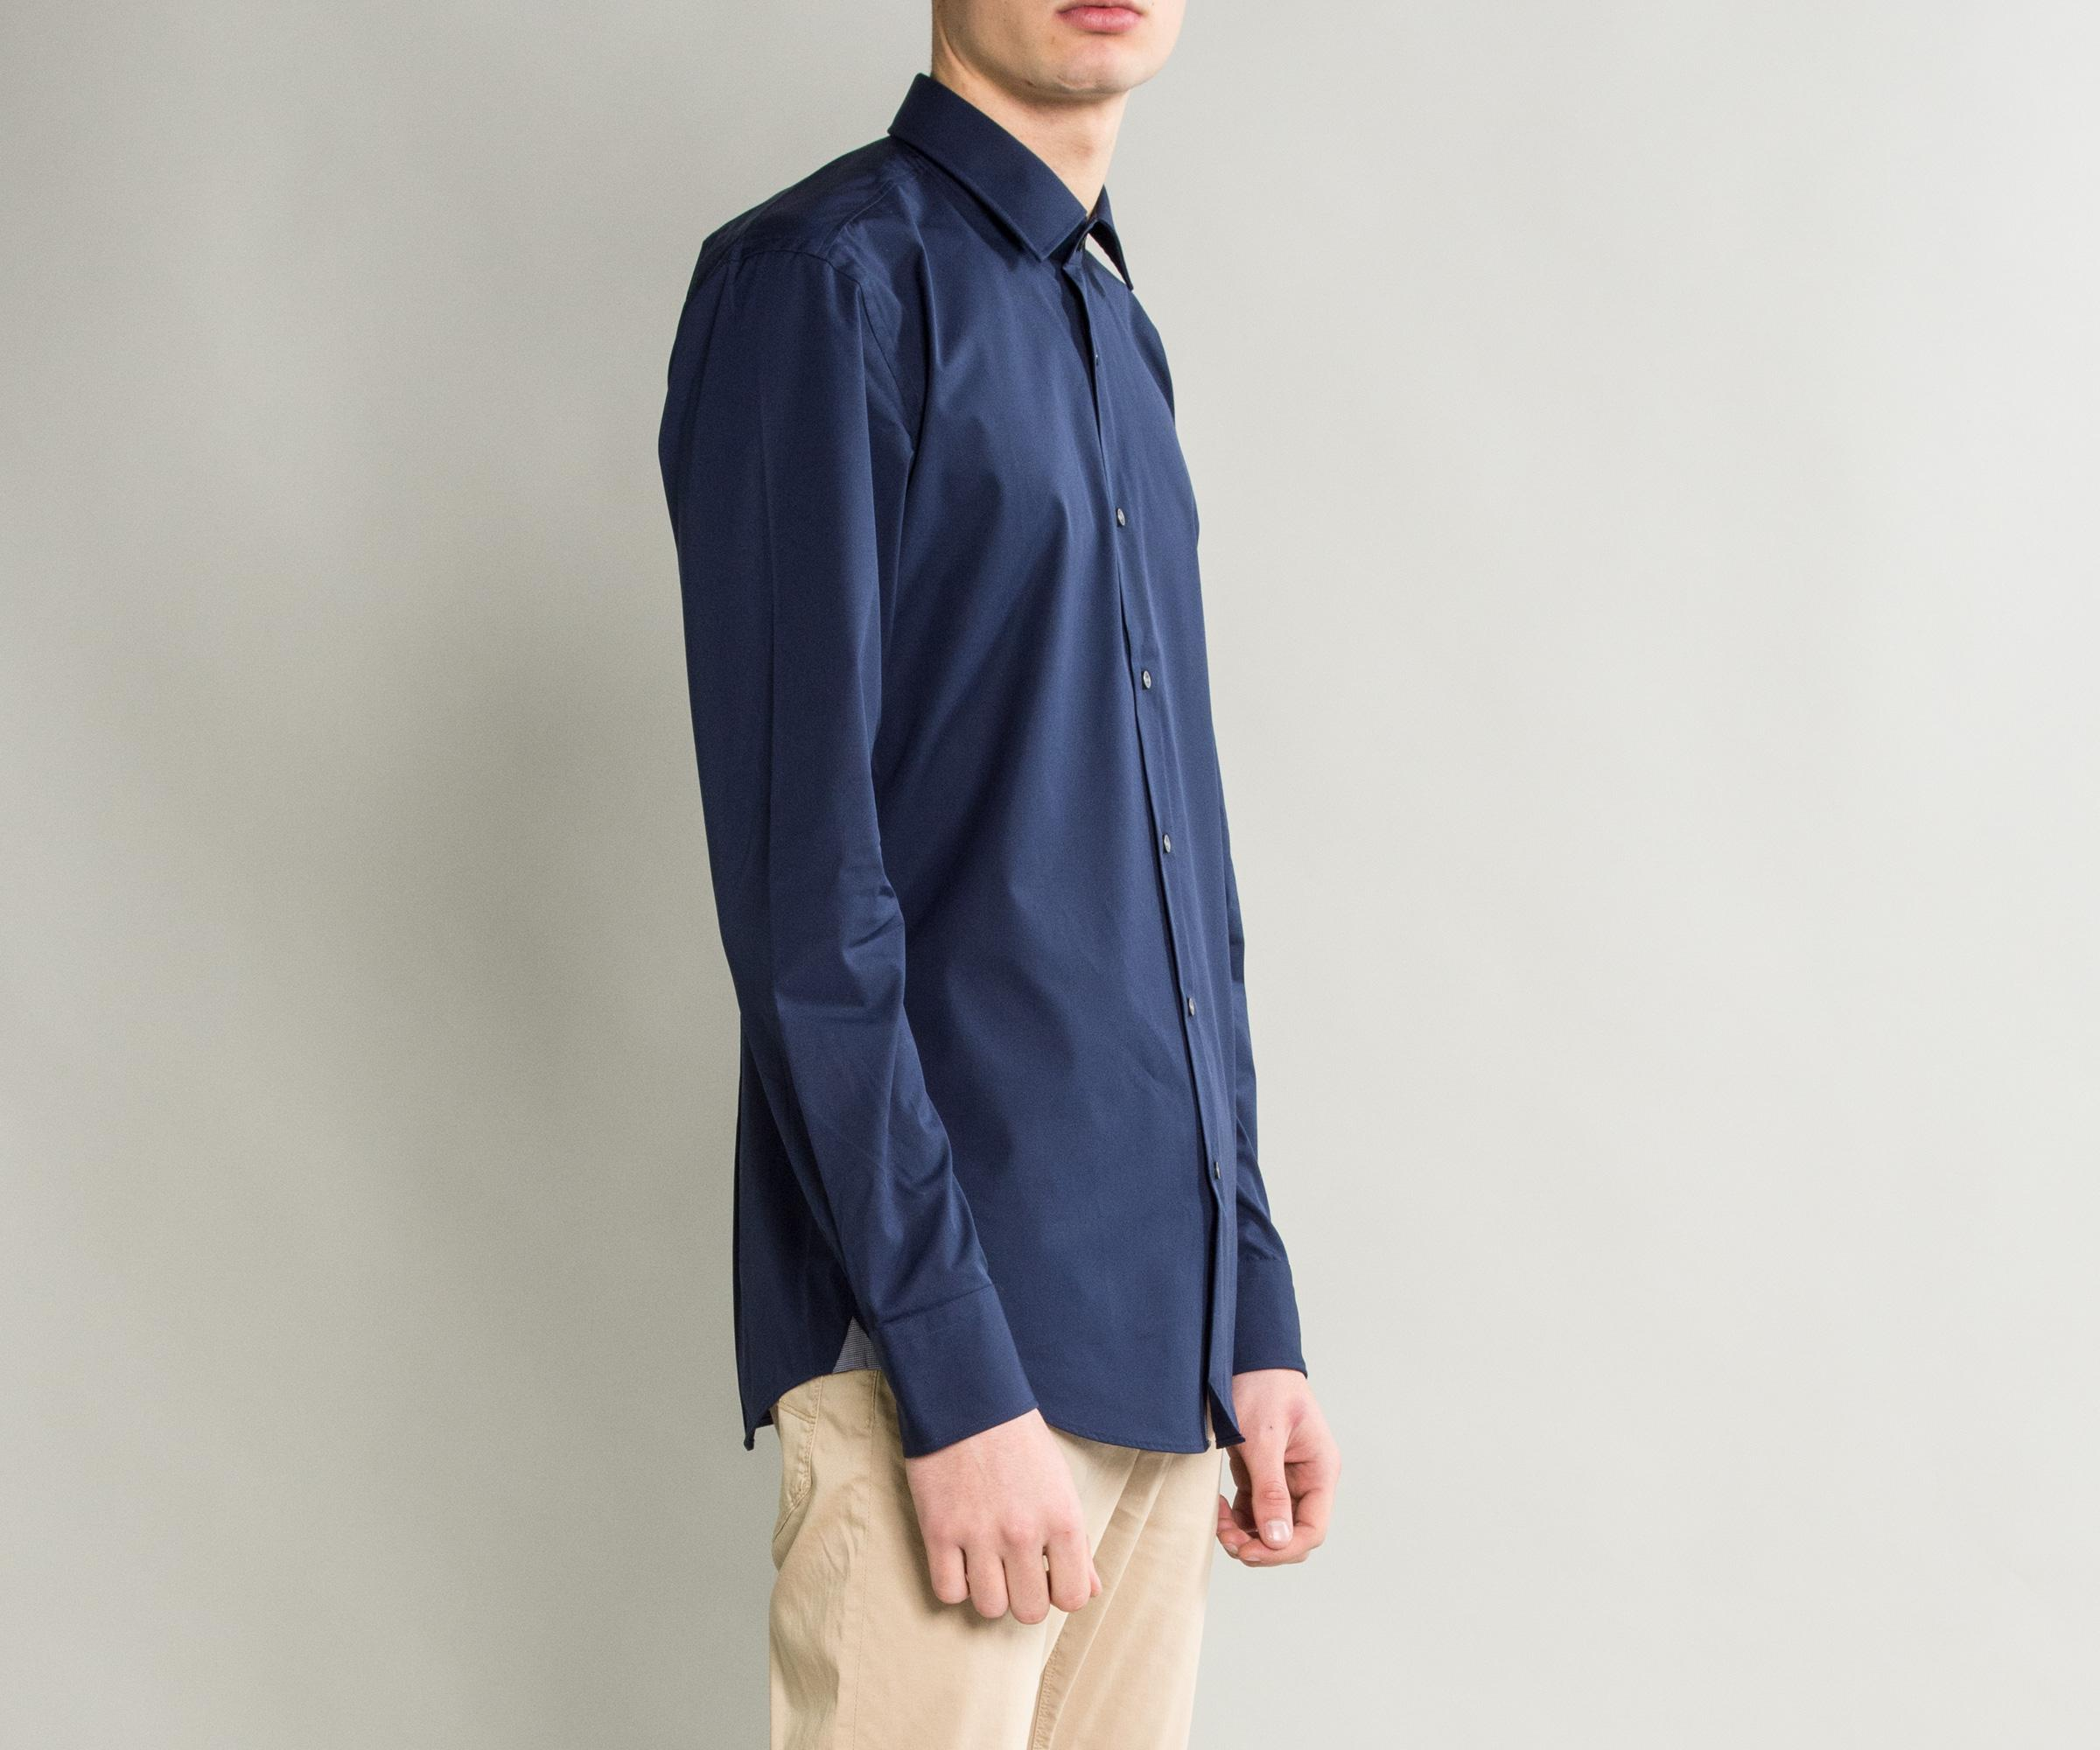 b86da6388 BOSS - Blue 'jerris' Easy Iron Formal Shirt Navy for Men - Lyst. View  fullscreen